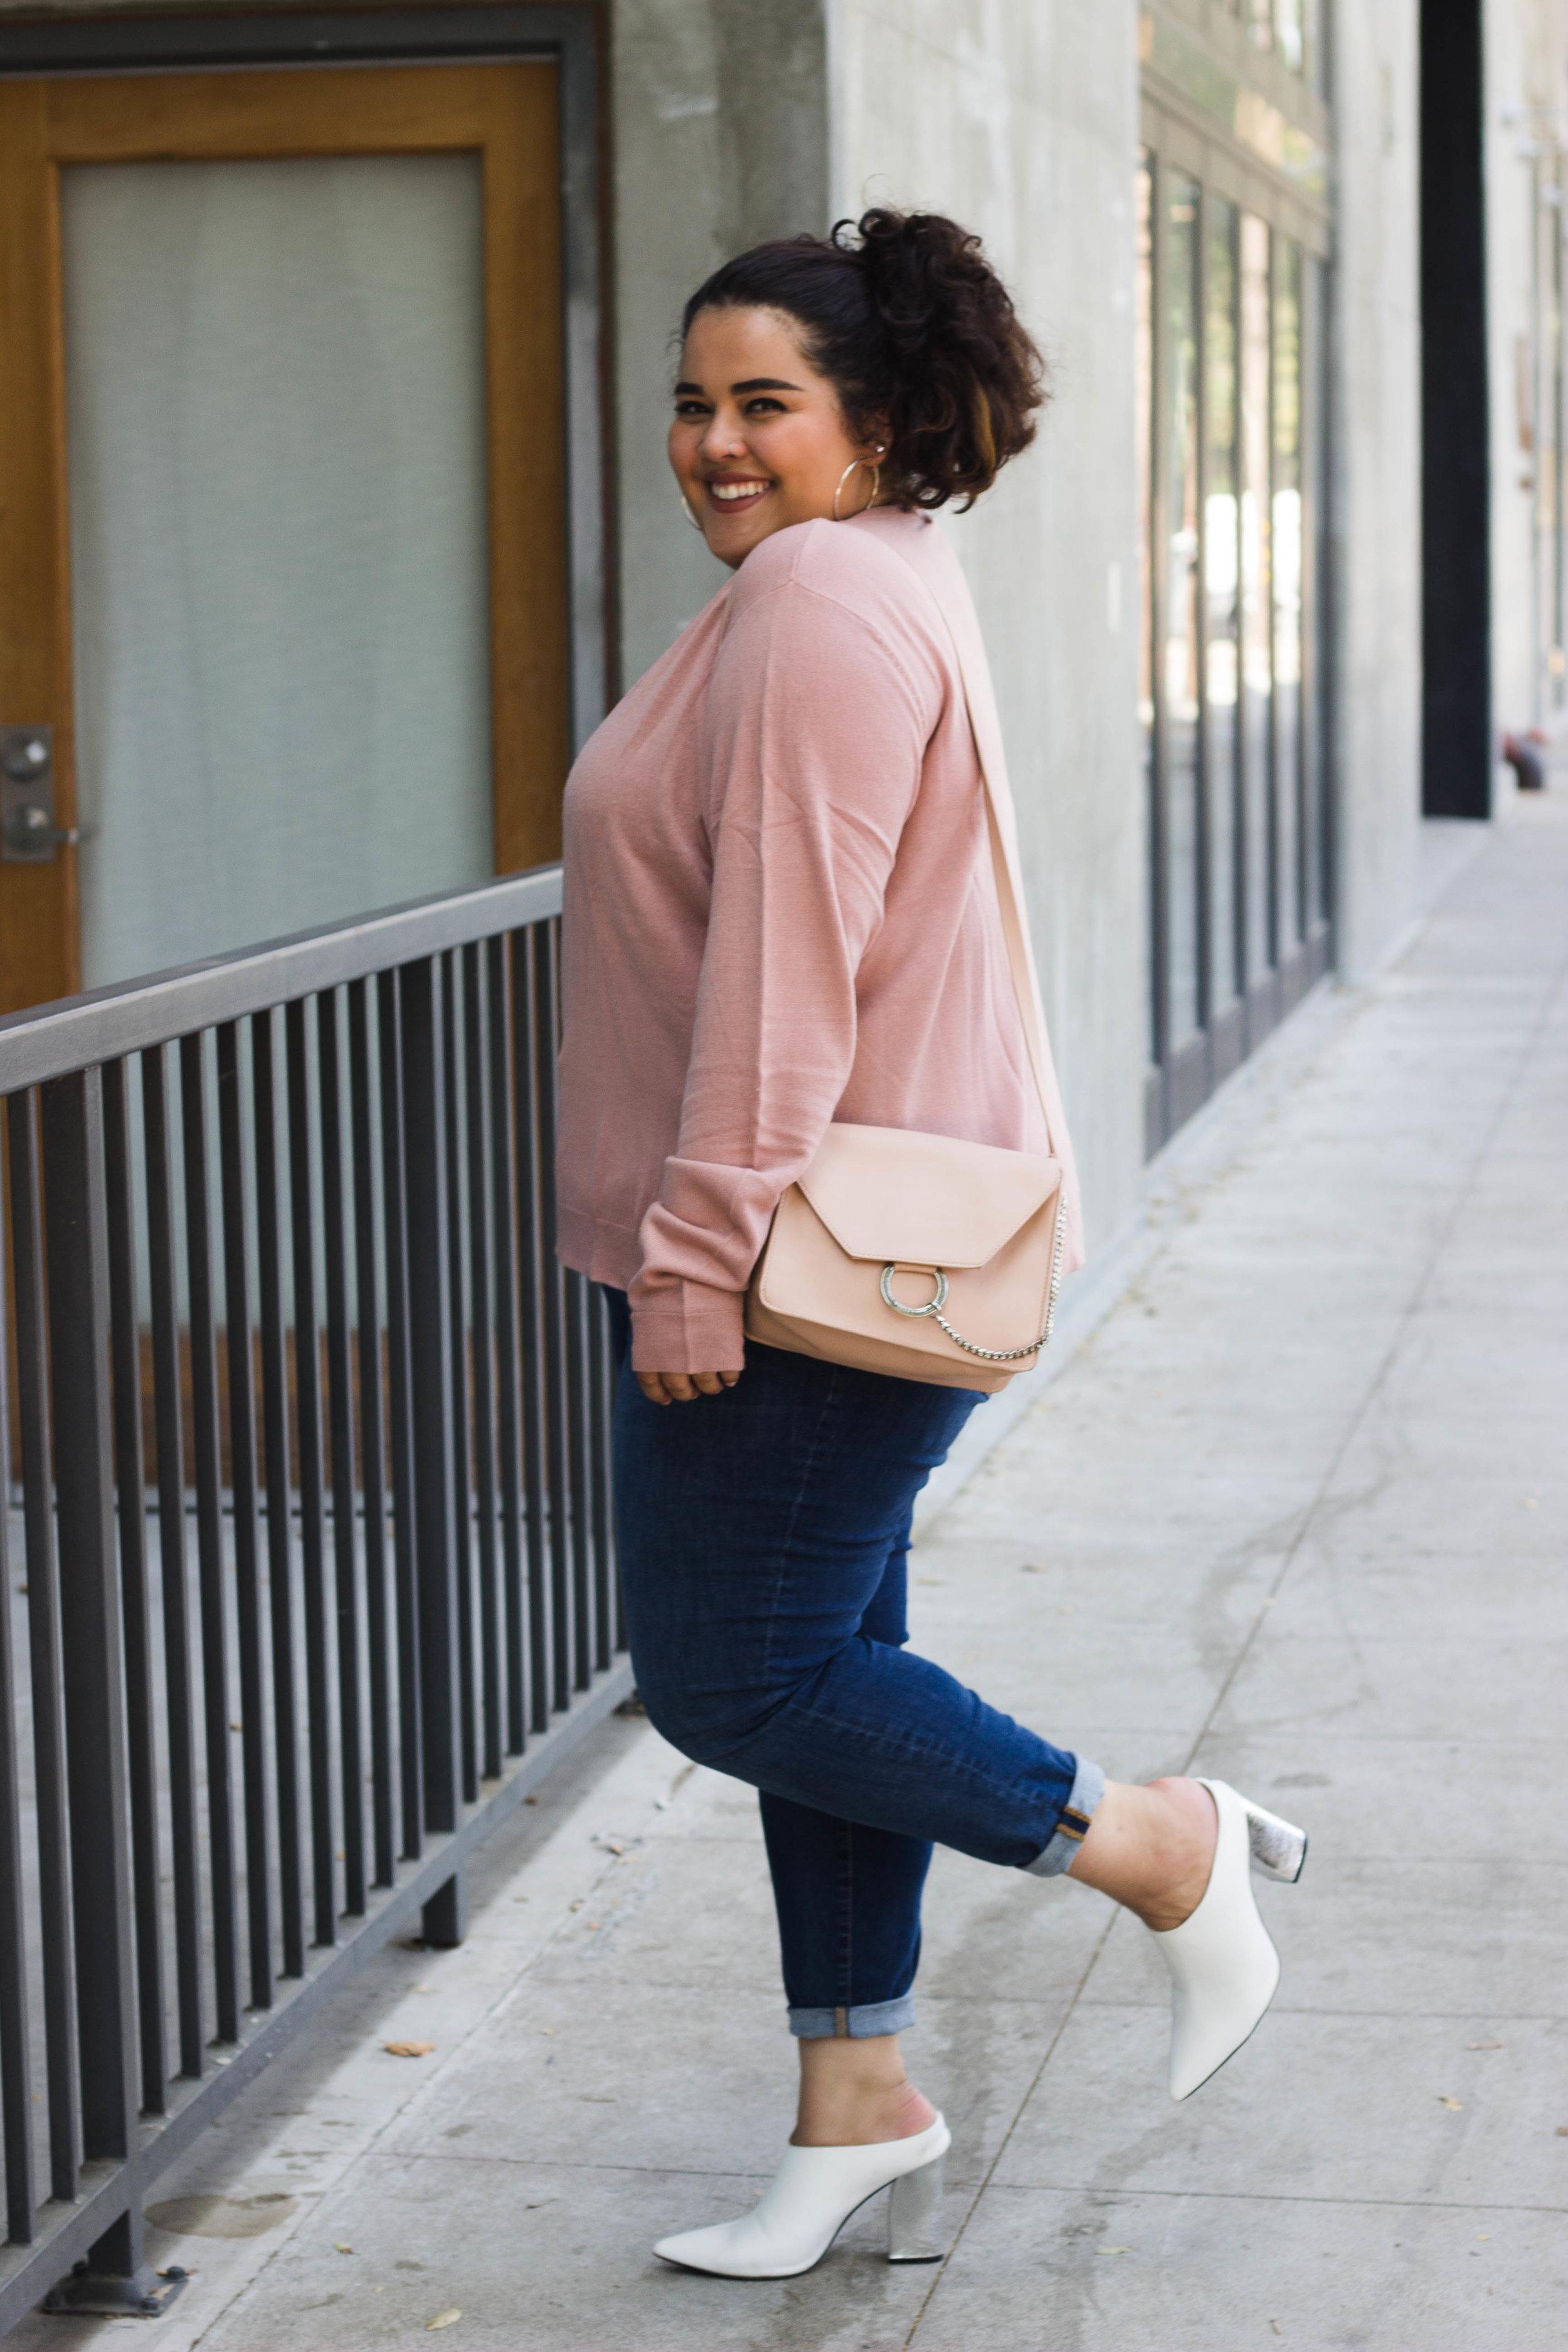 pinksweater (22 of 24).jpg